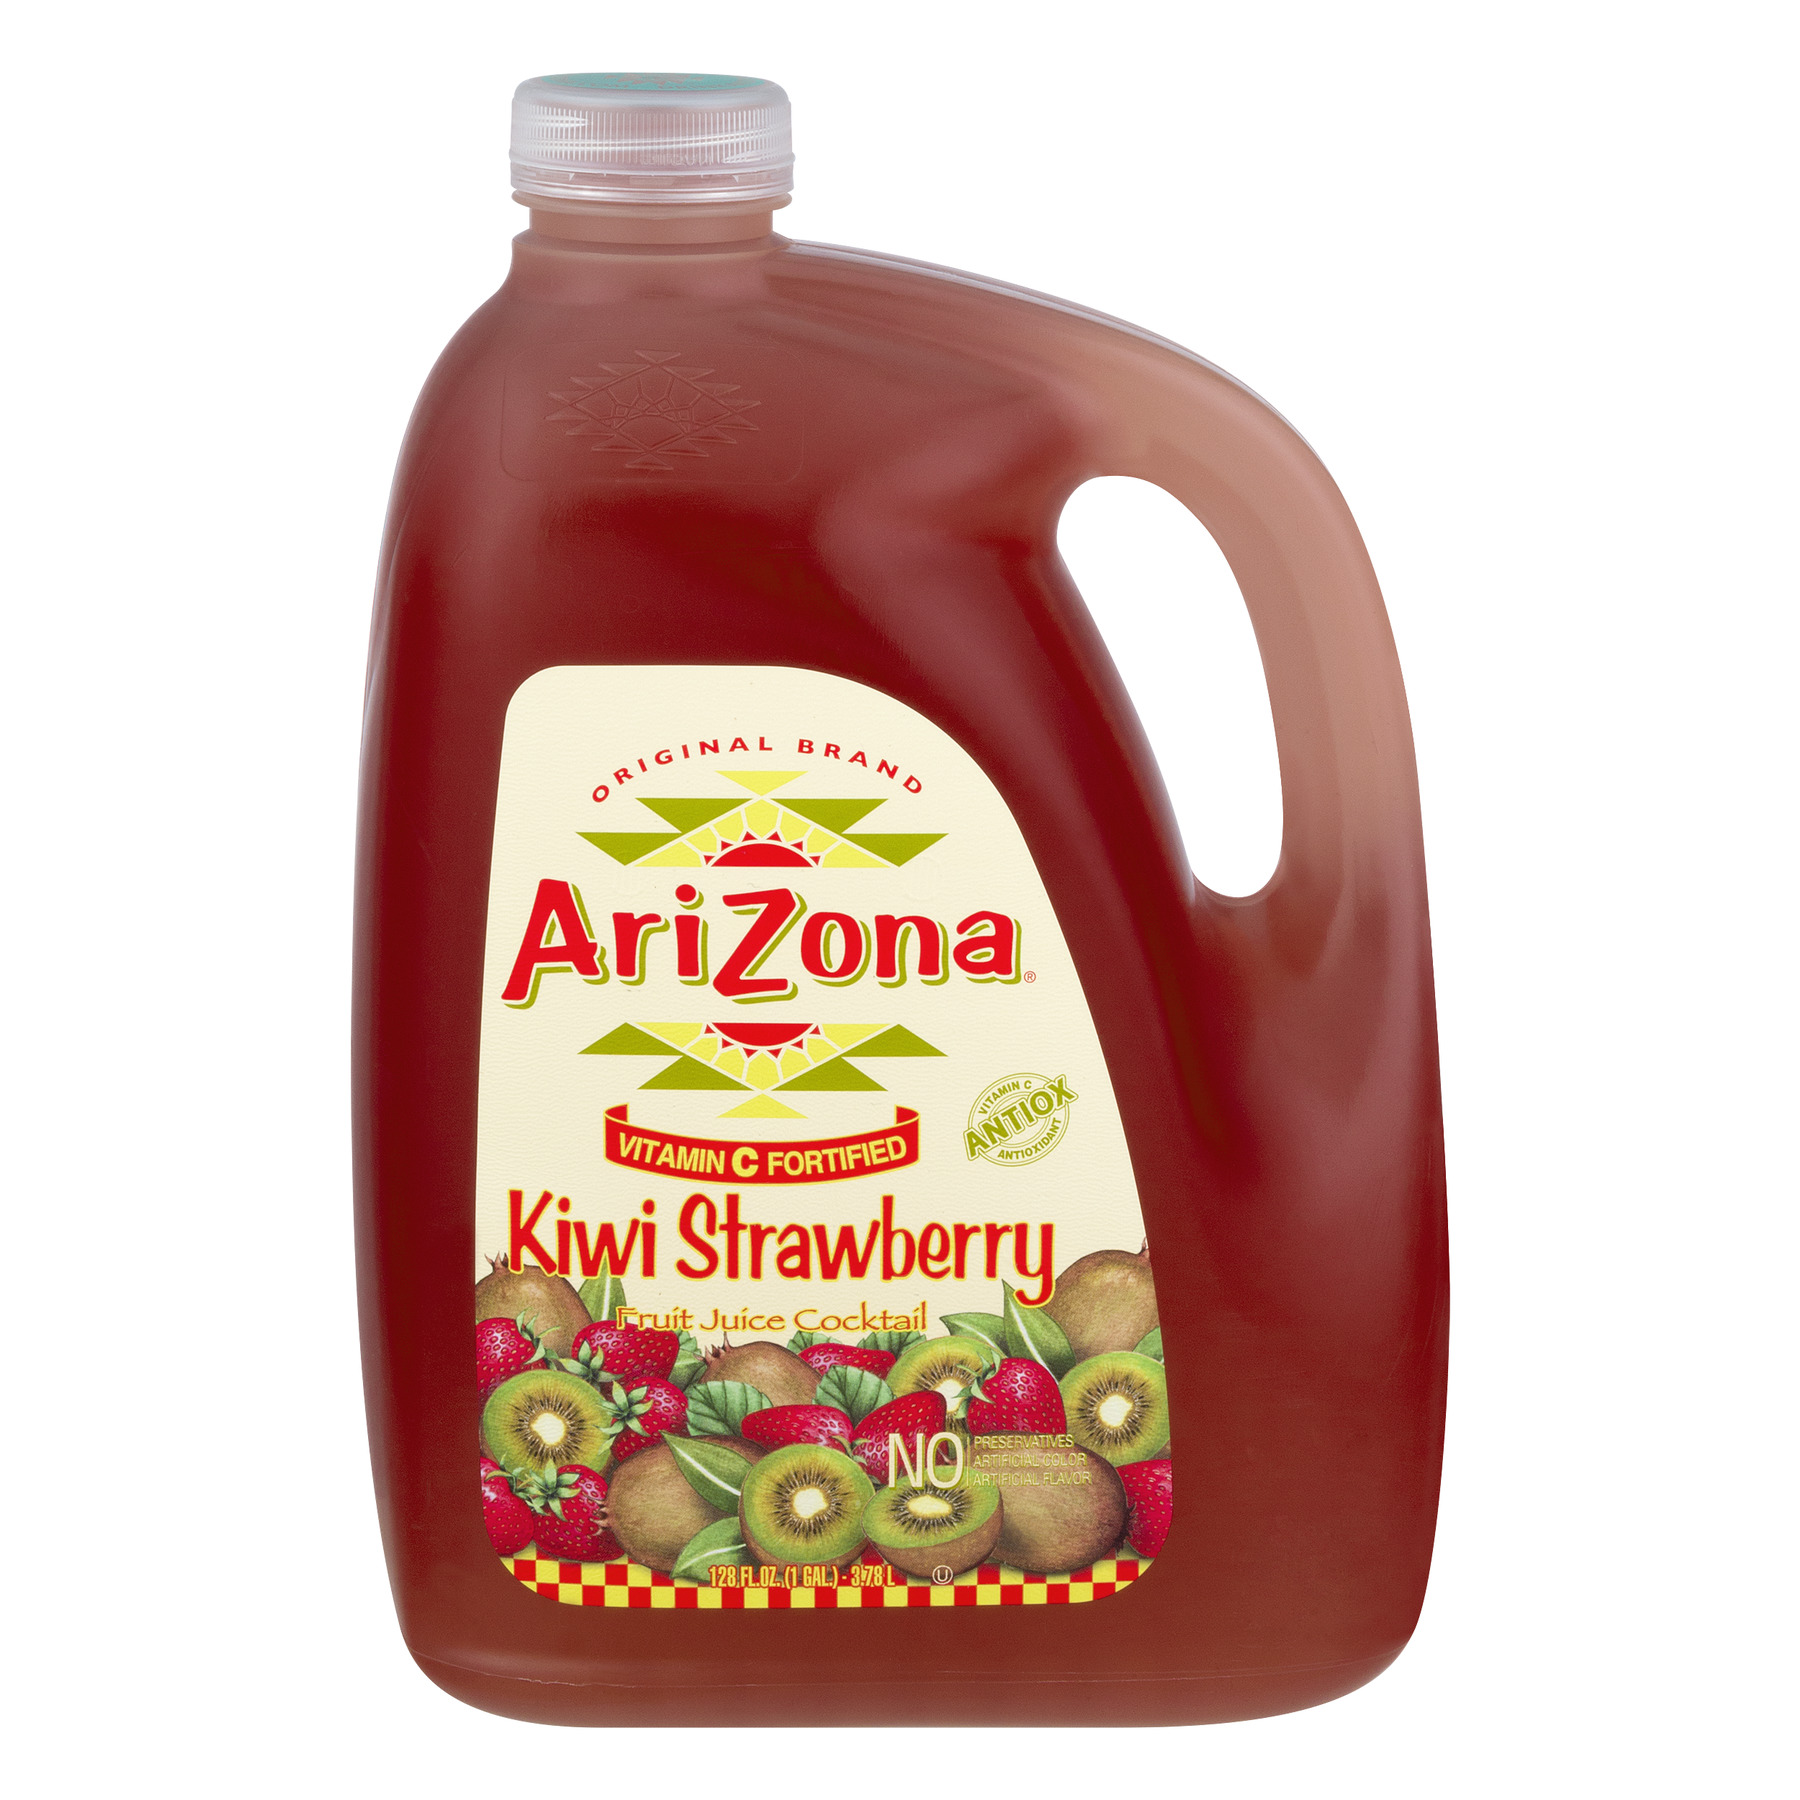 2 Pack Arizona Juice Cocktail Kiwi Strawberry 128 Fl Oz 1 Count Walmart Com Walmart Com,Black And White Cats Breed